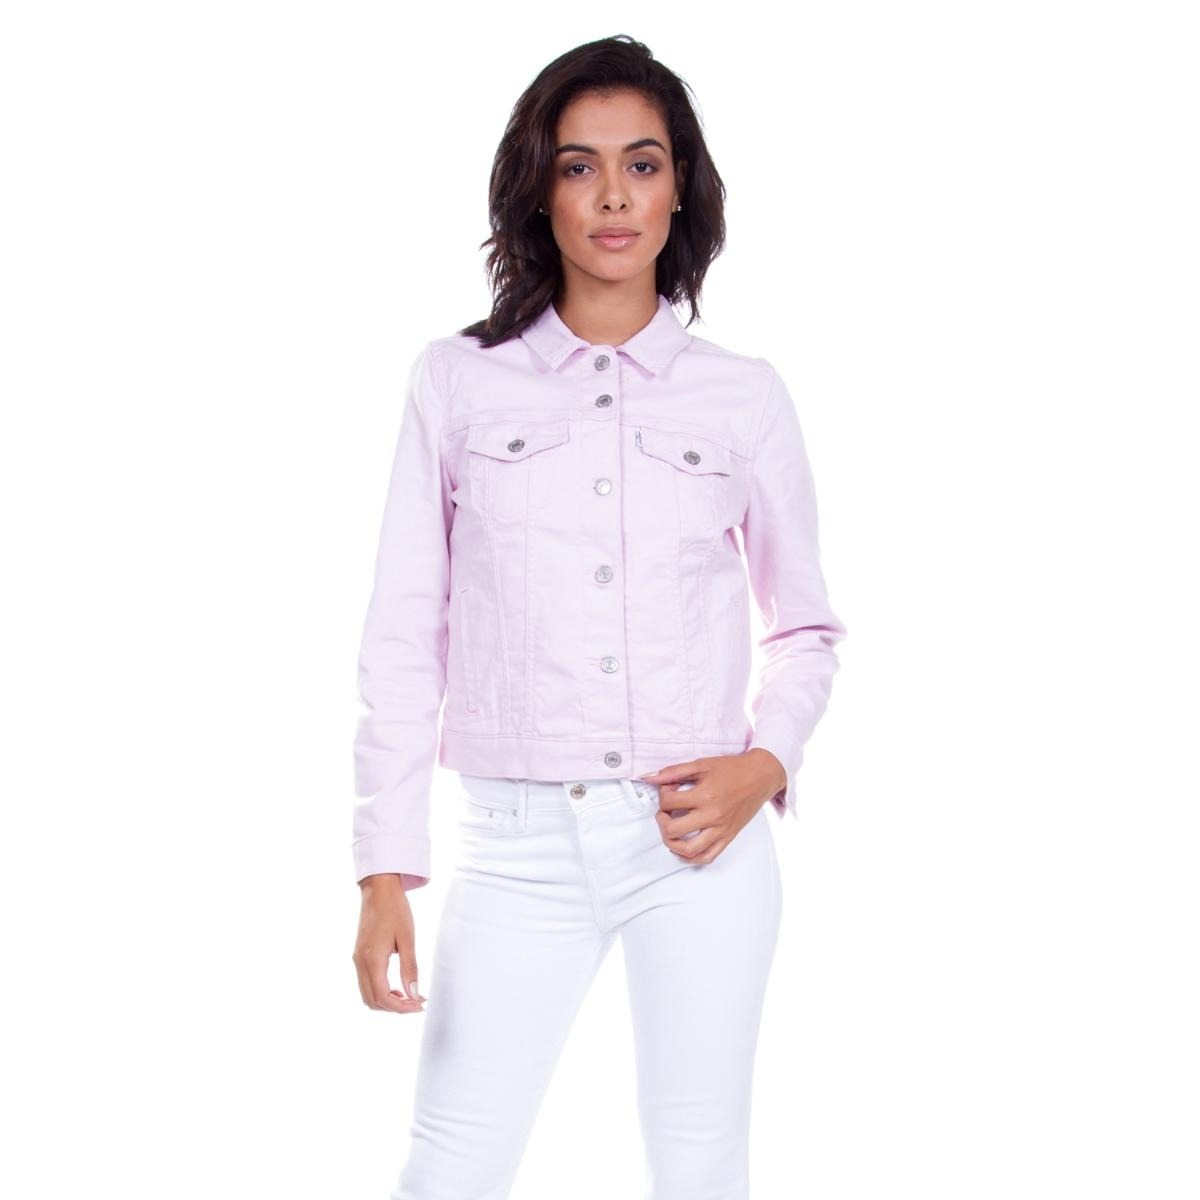 3006e6a941 Jaqueta Jeans Levis Trucker Original Rosa - R$ 194,90 em Mercado Livre